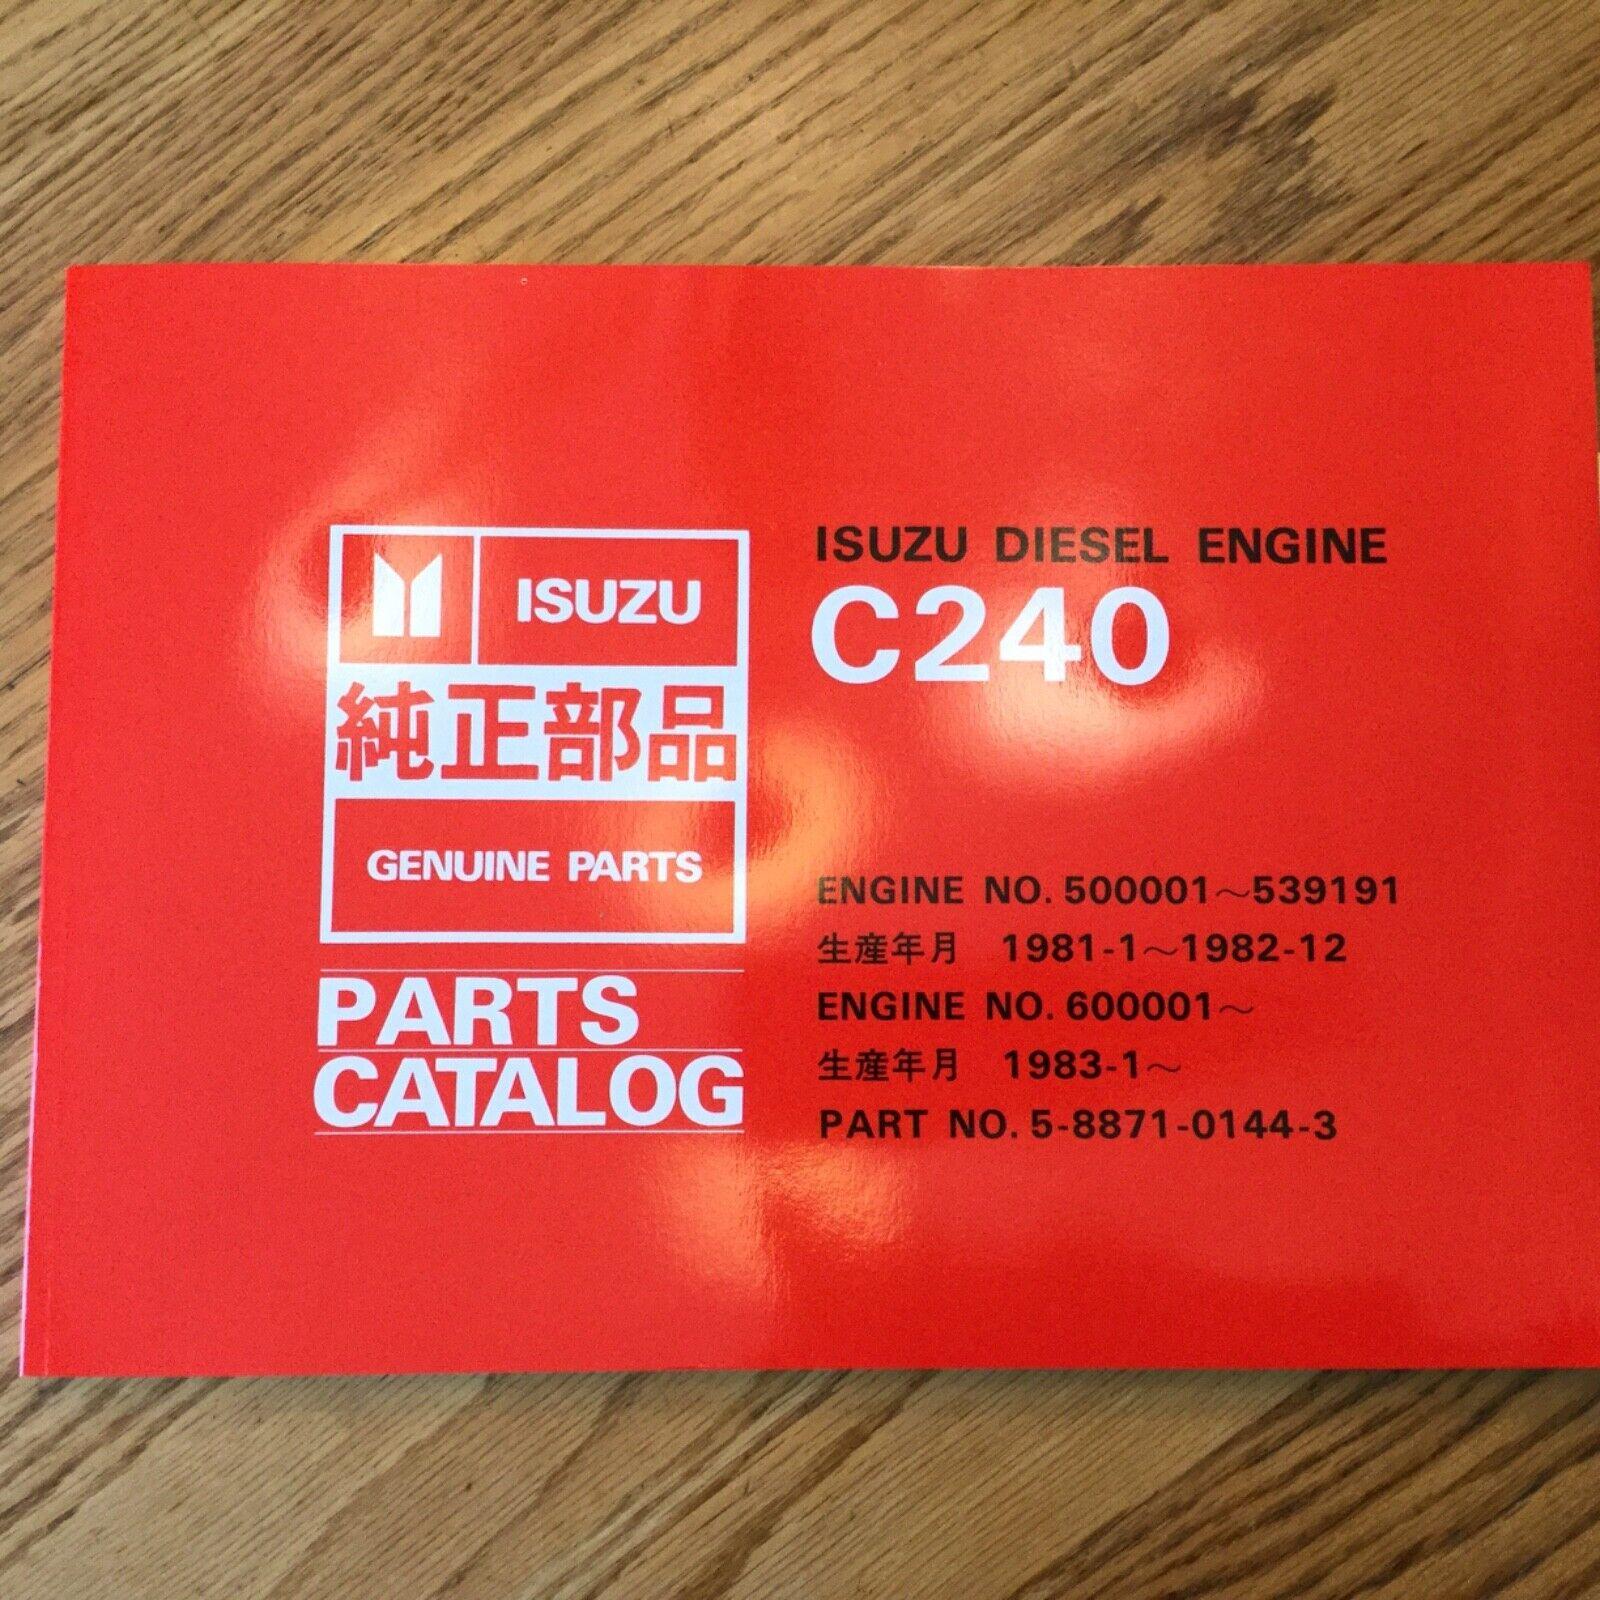 Isuzu C240 PARTS MANUAL BOOK CATALOG ENGINE DIESEL GUIDE LIST 5-8871-0144-3  *NEW for sale onlineeBay